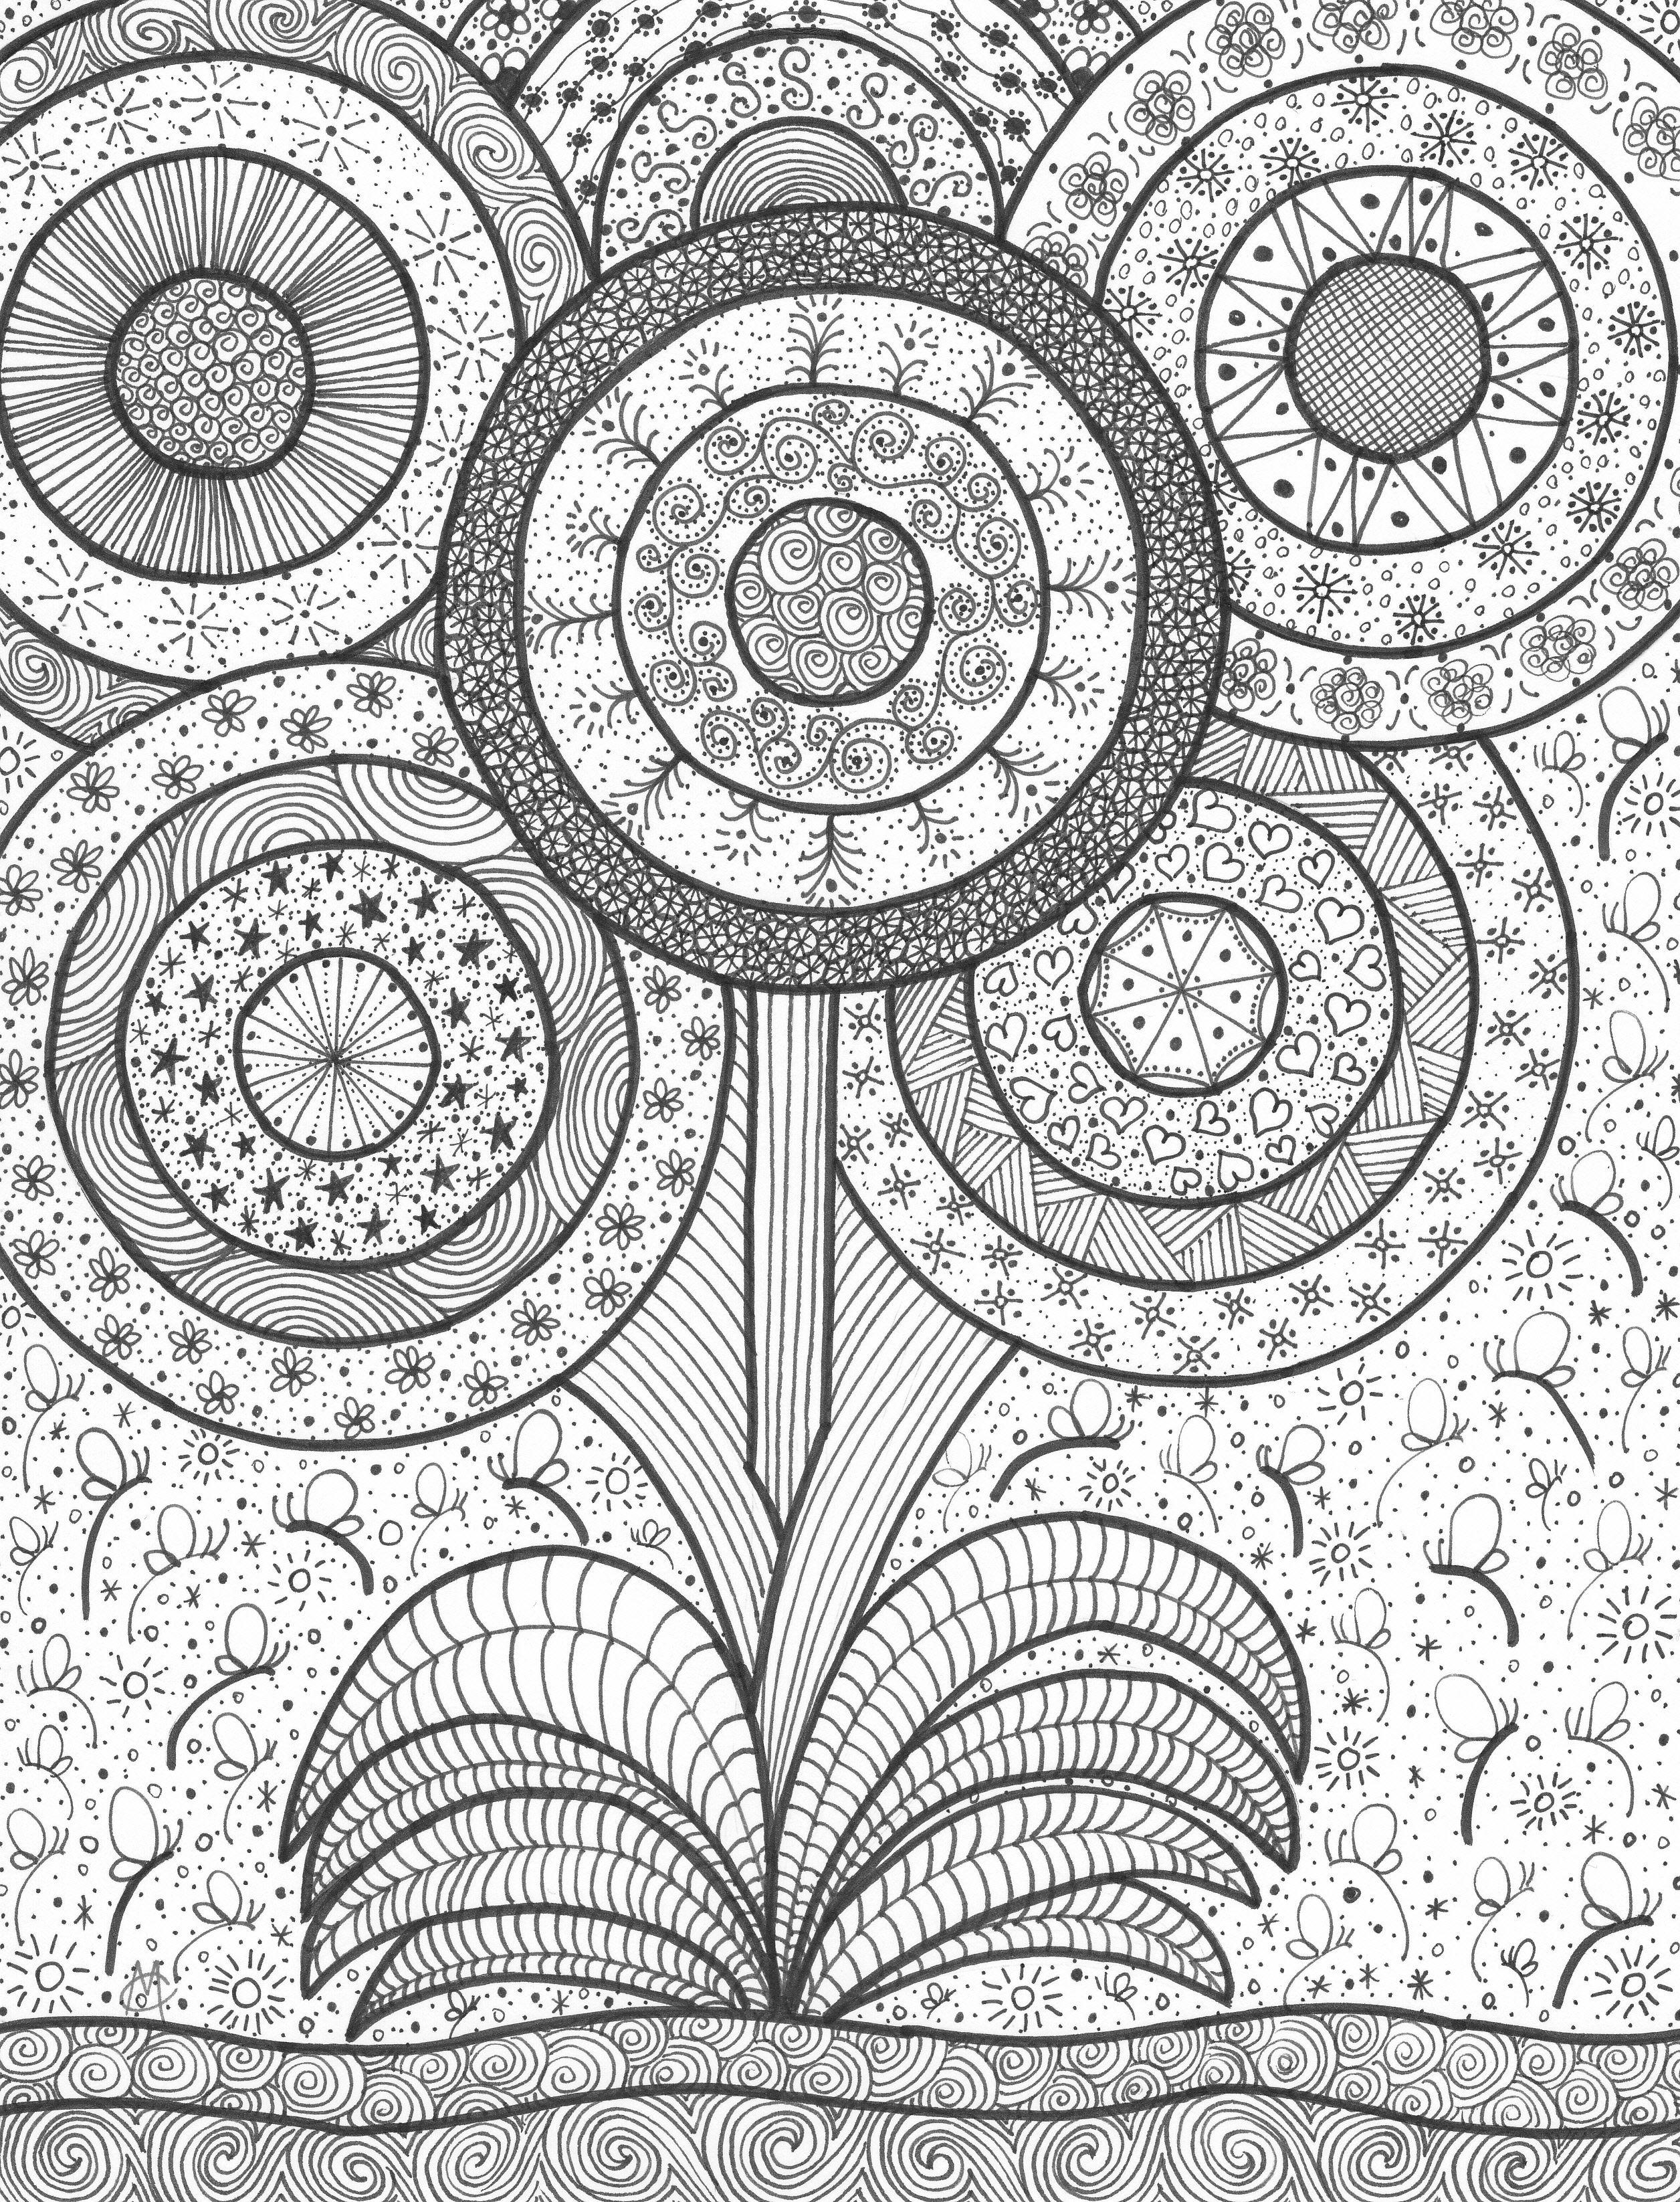 Flowers an original artwork by Cat Magness   dibujos   Pinterest ...